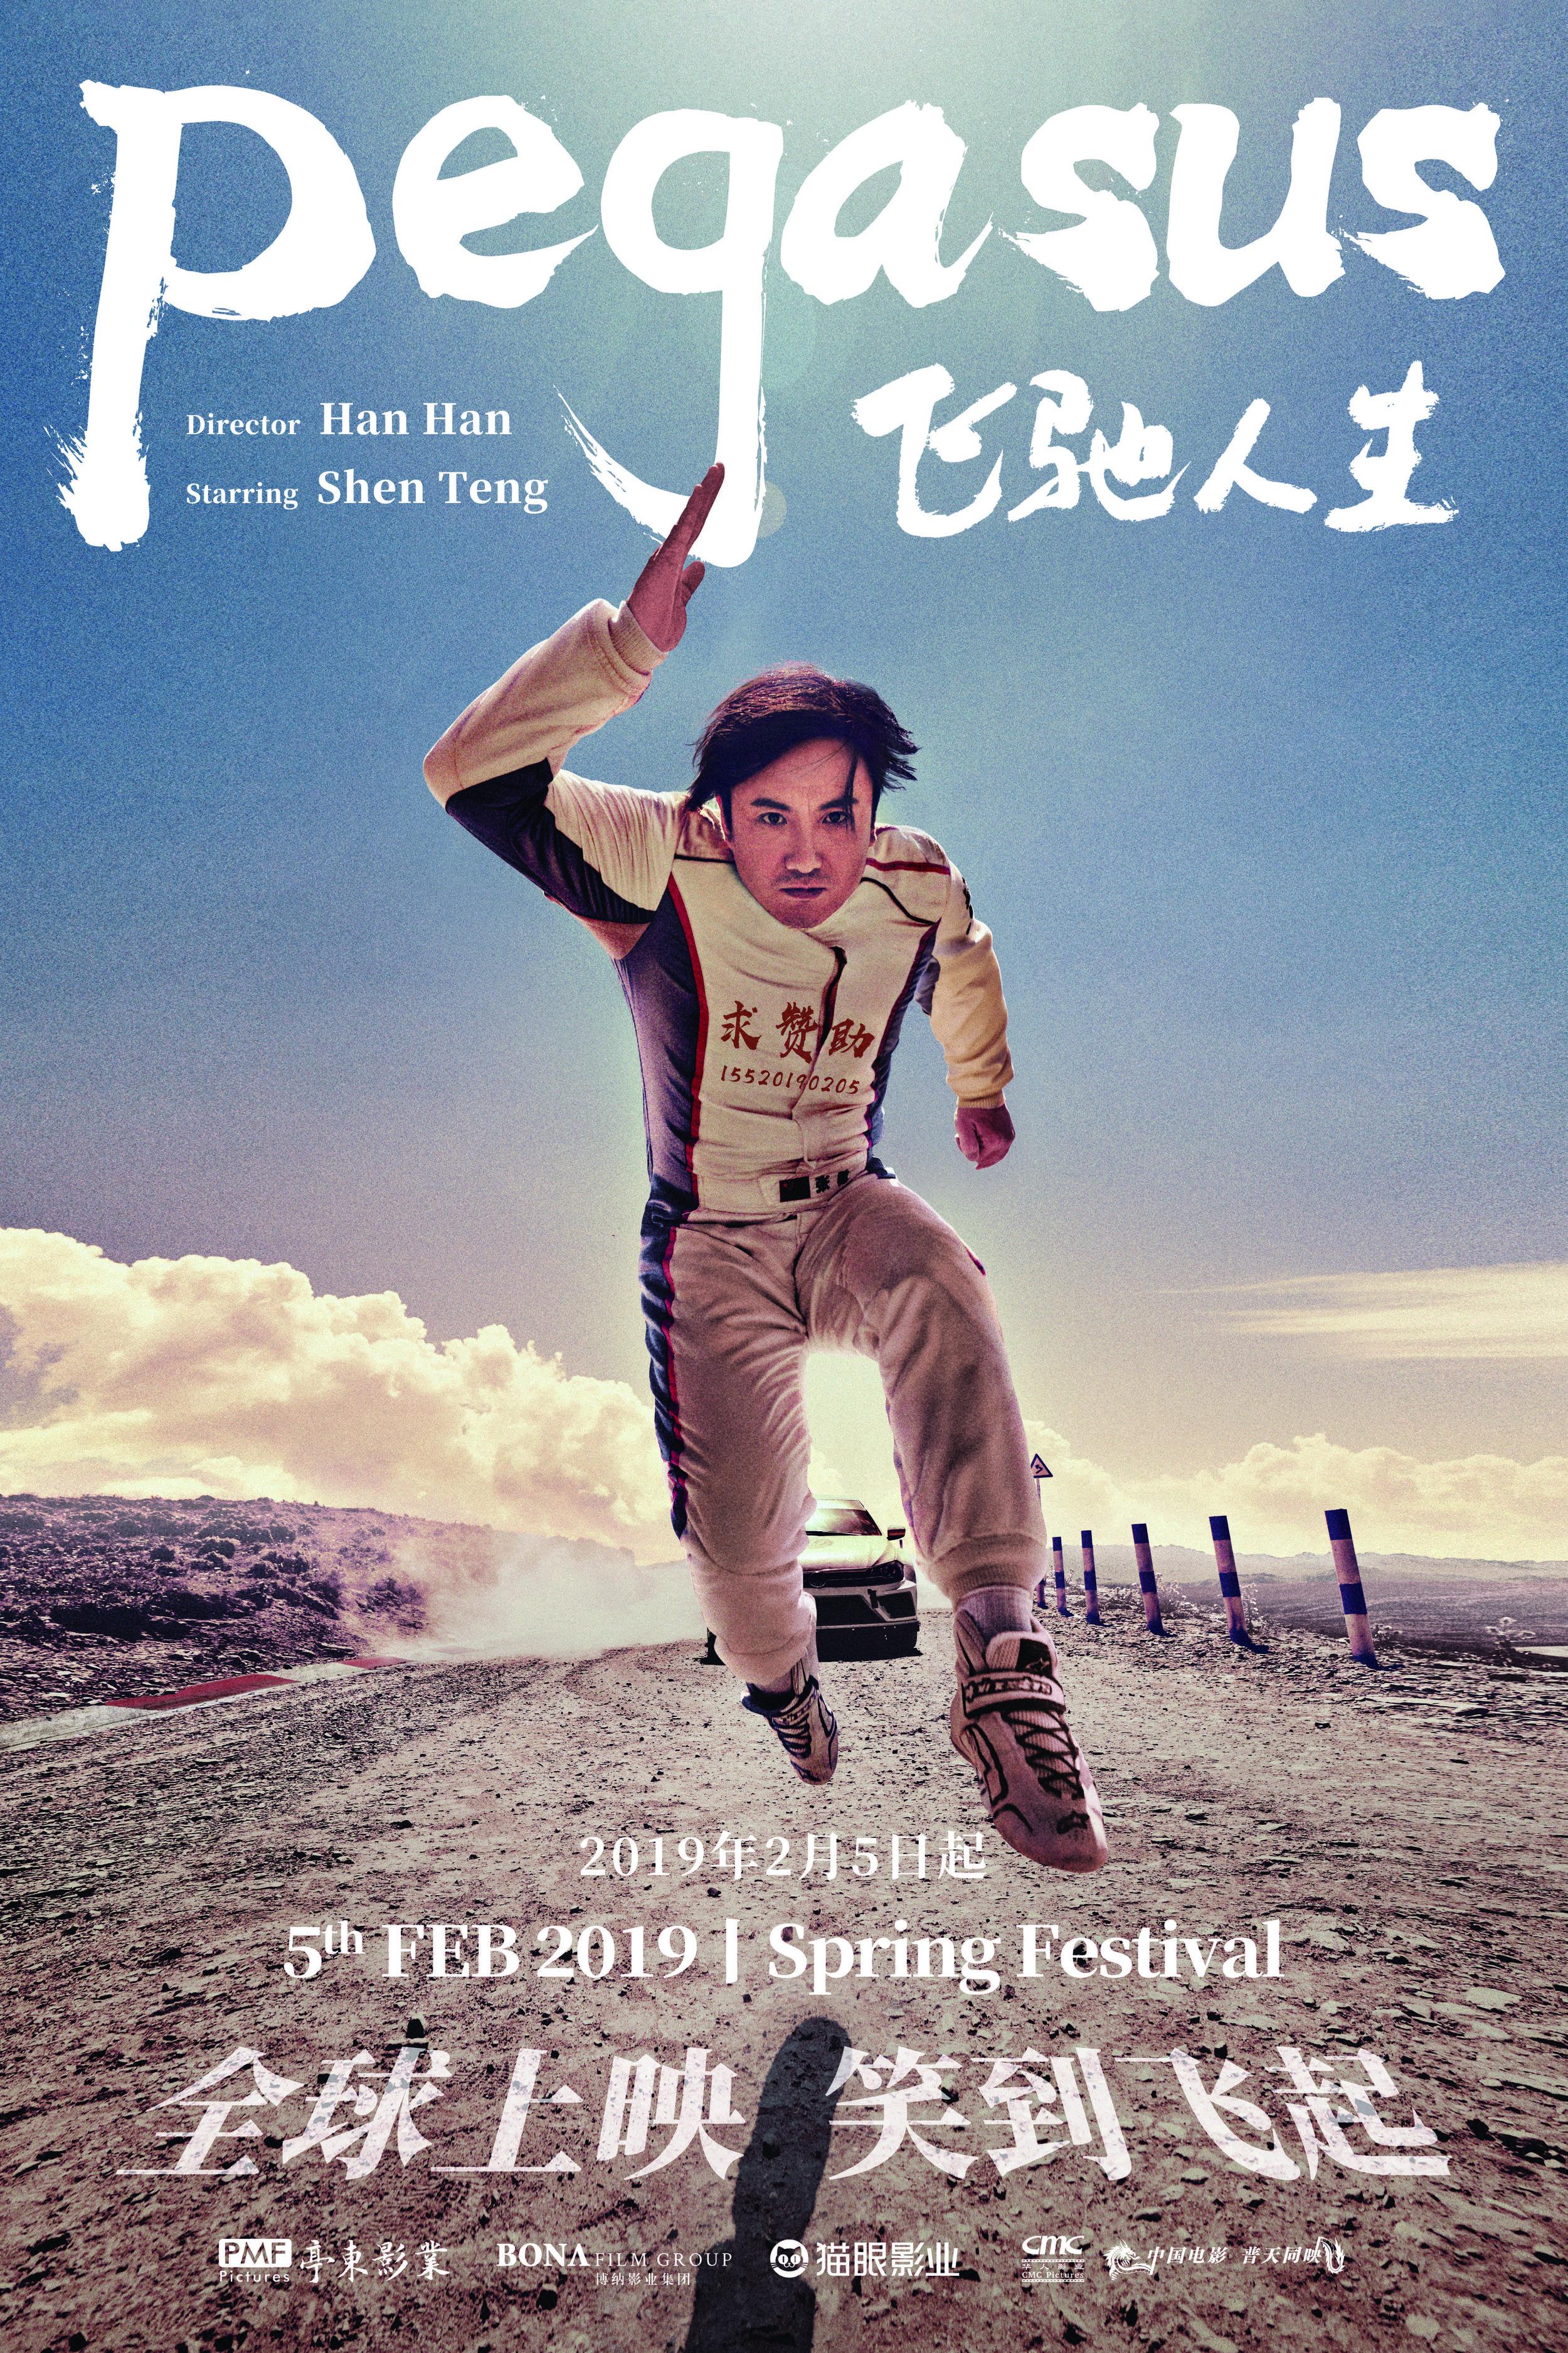 Pegasus-Poster-飞驰人生-定档海报线下.jpg